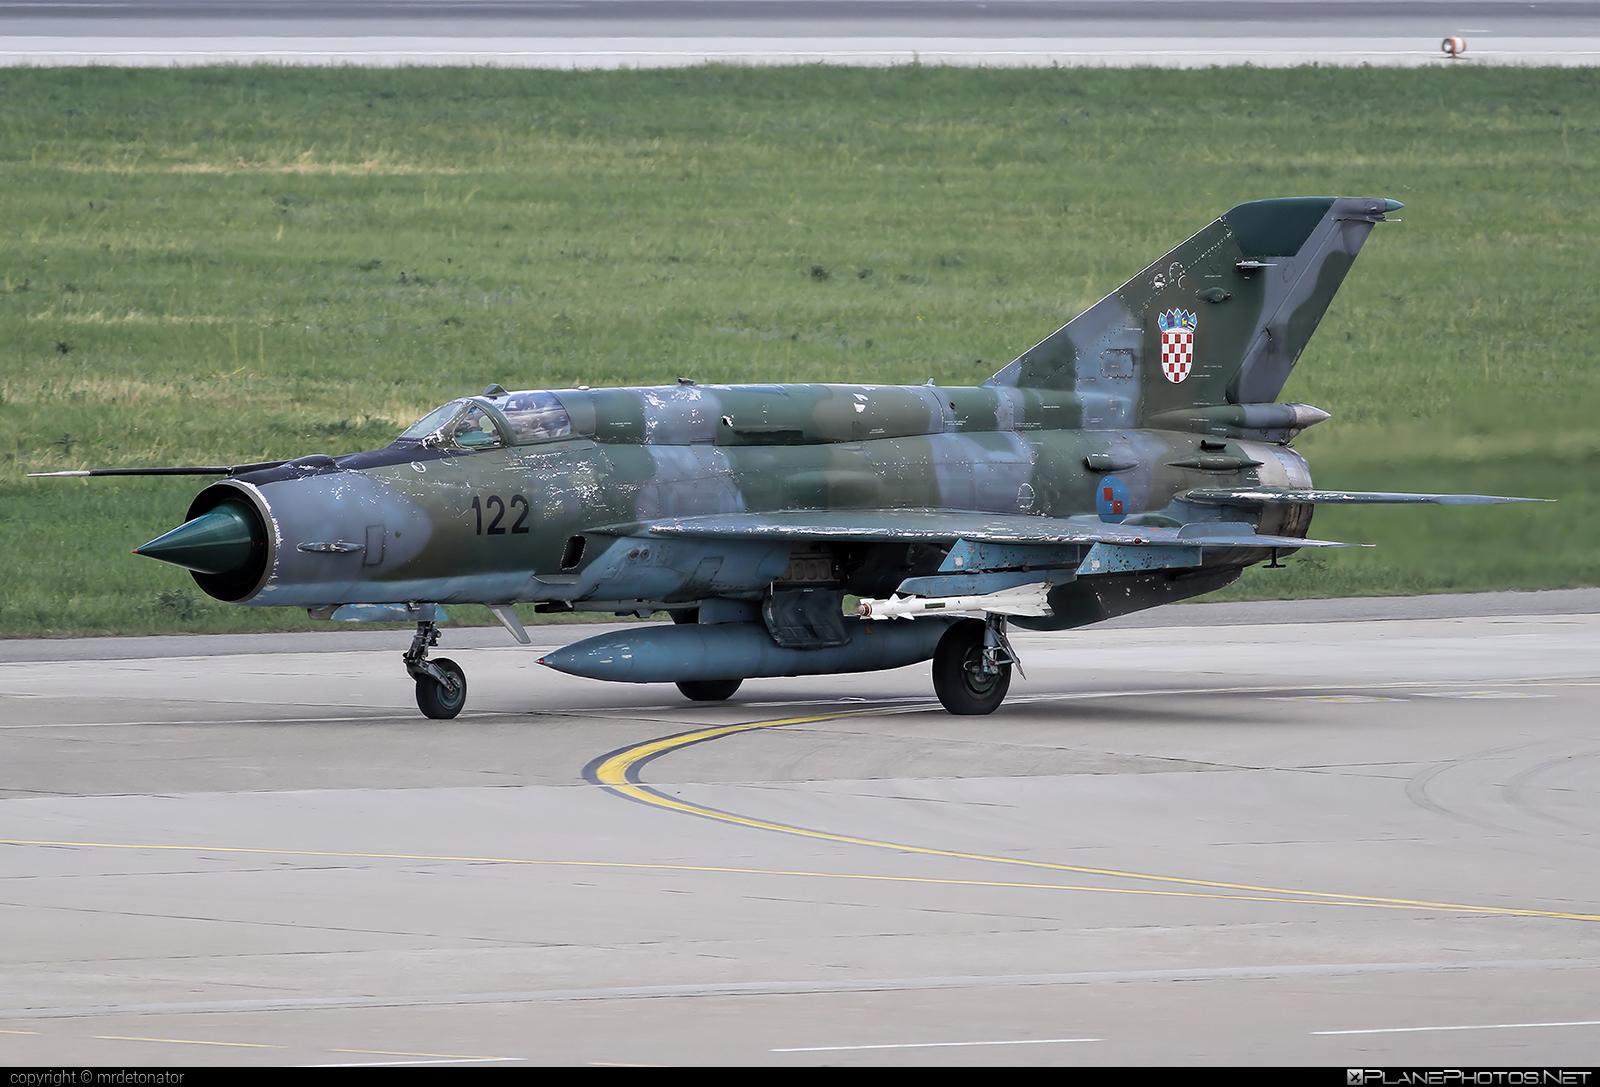 Mikoyan-Gurevich MiG-21bis-D - 122 operated by Hrvatsko ratno zrakoplovstvo i protuzračna obrana (Croatian Air Force) #mig #mig21 #mig21bisd #mikoyangurevich